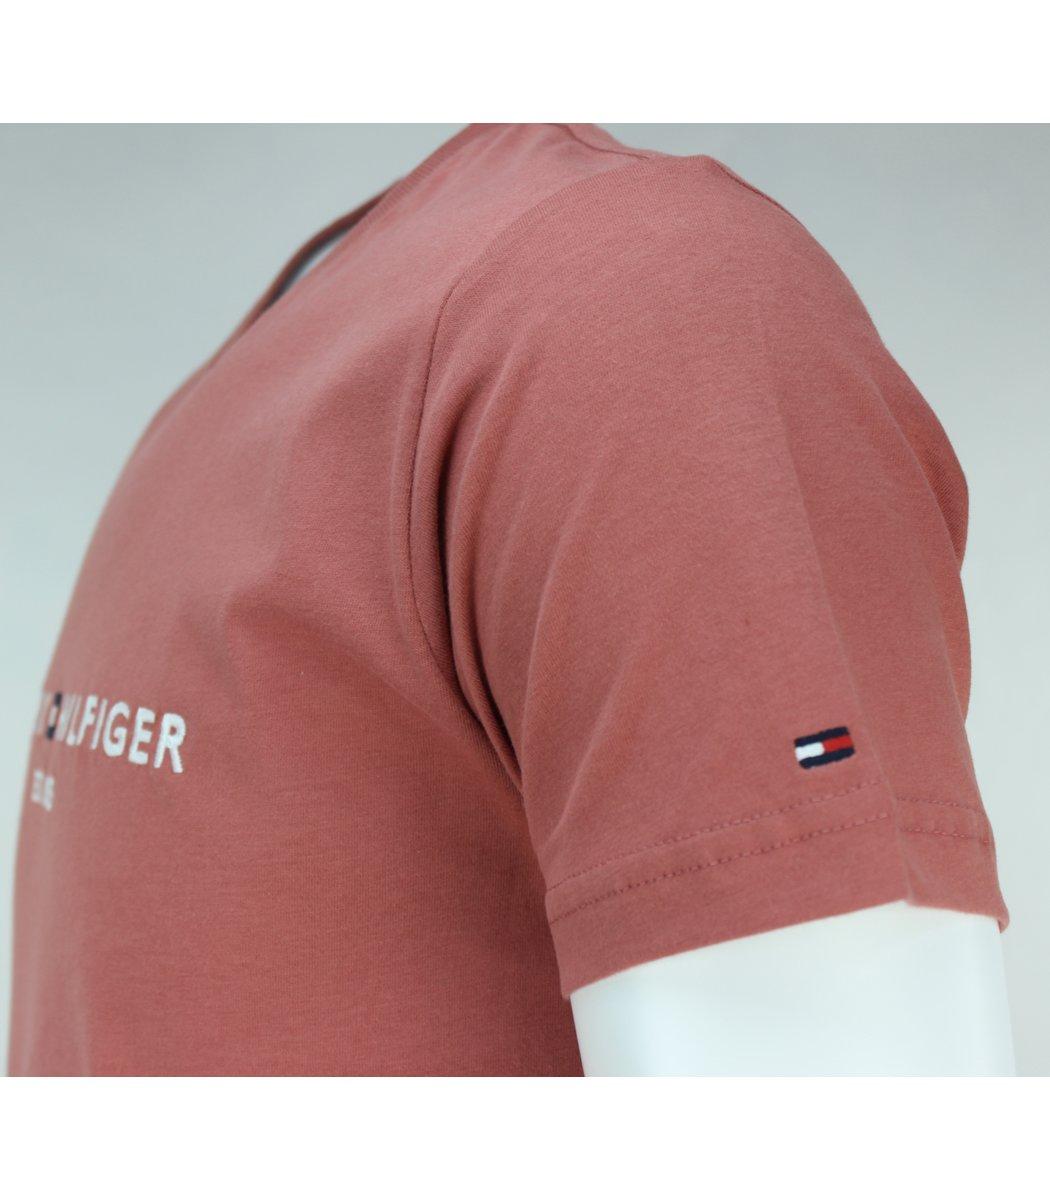 Кирпичная футболка Tommy Hilfiger с вышивкой FT3